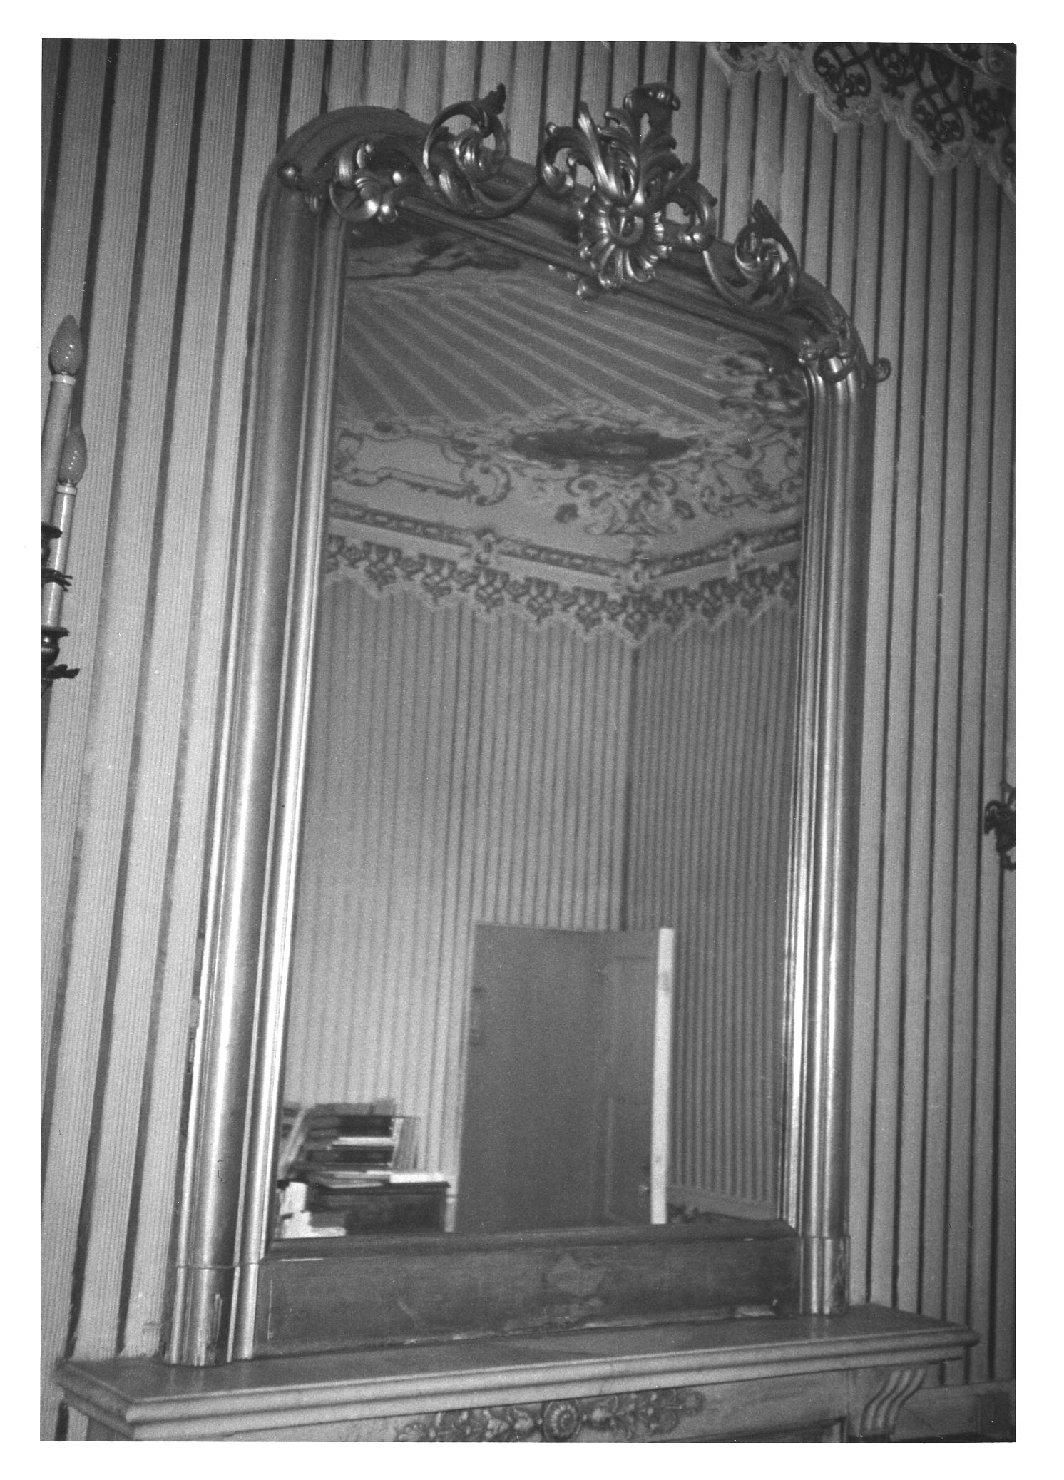 specchiera, opera isolata - manifattura veneta (sec. XIX)